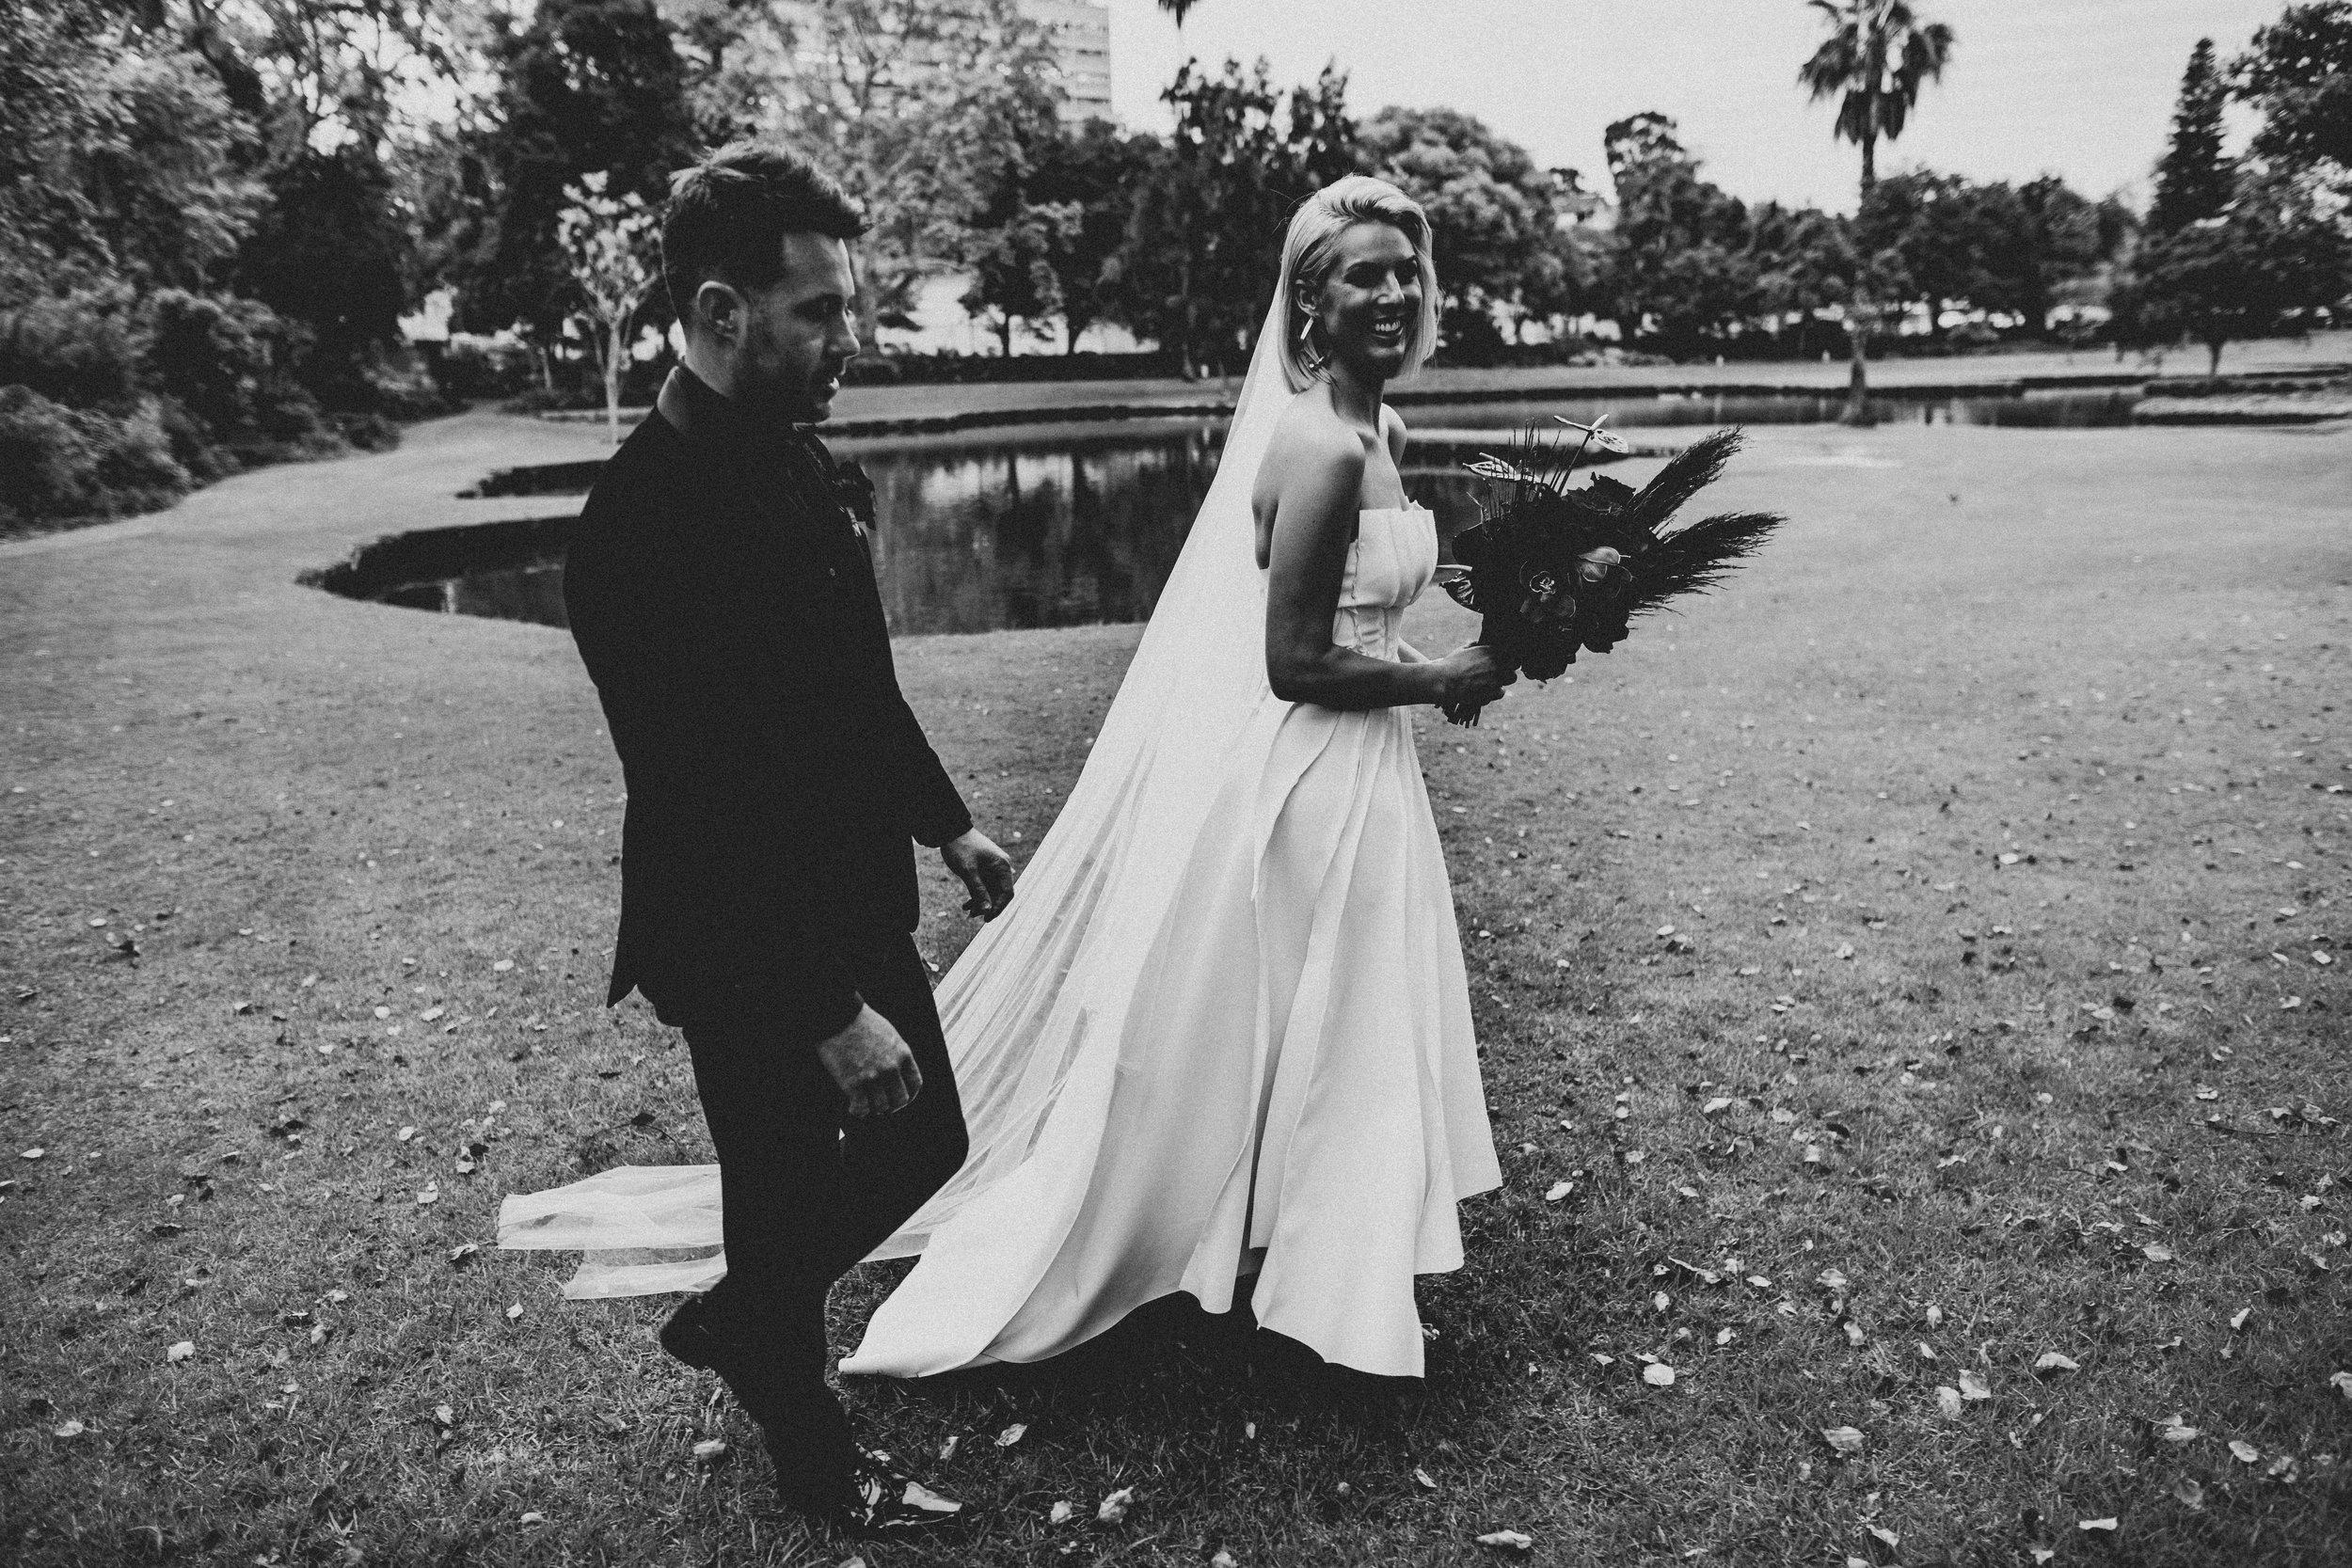 Courtney & Luke // Photo: Varga Murphy